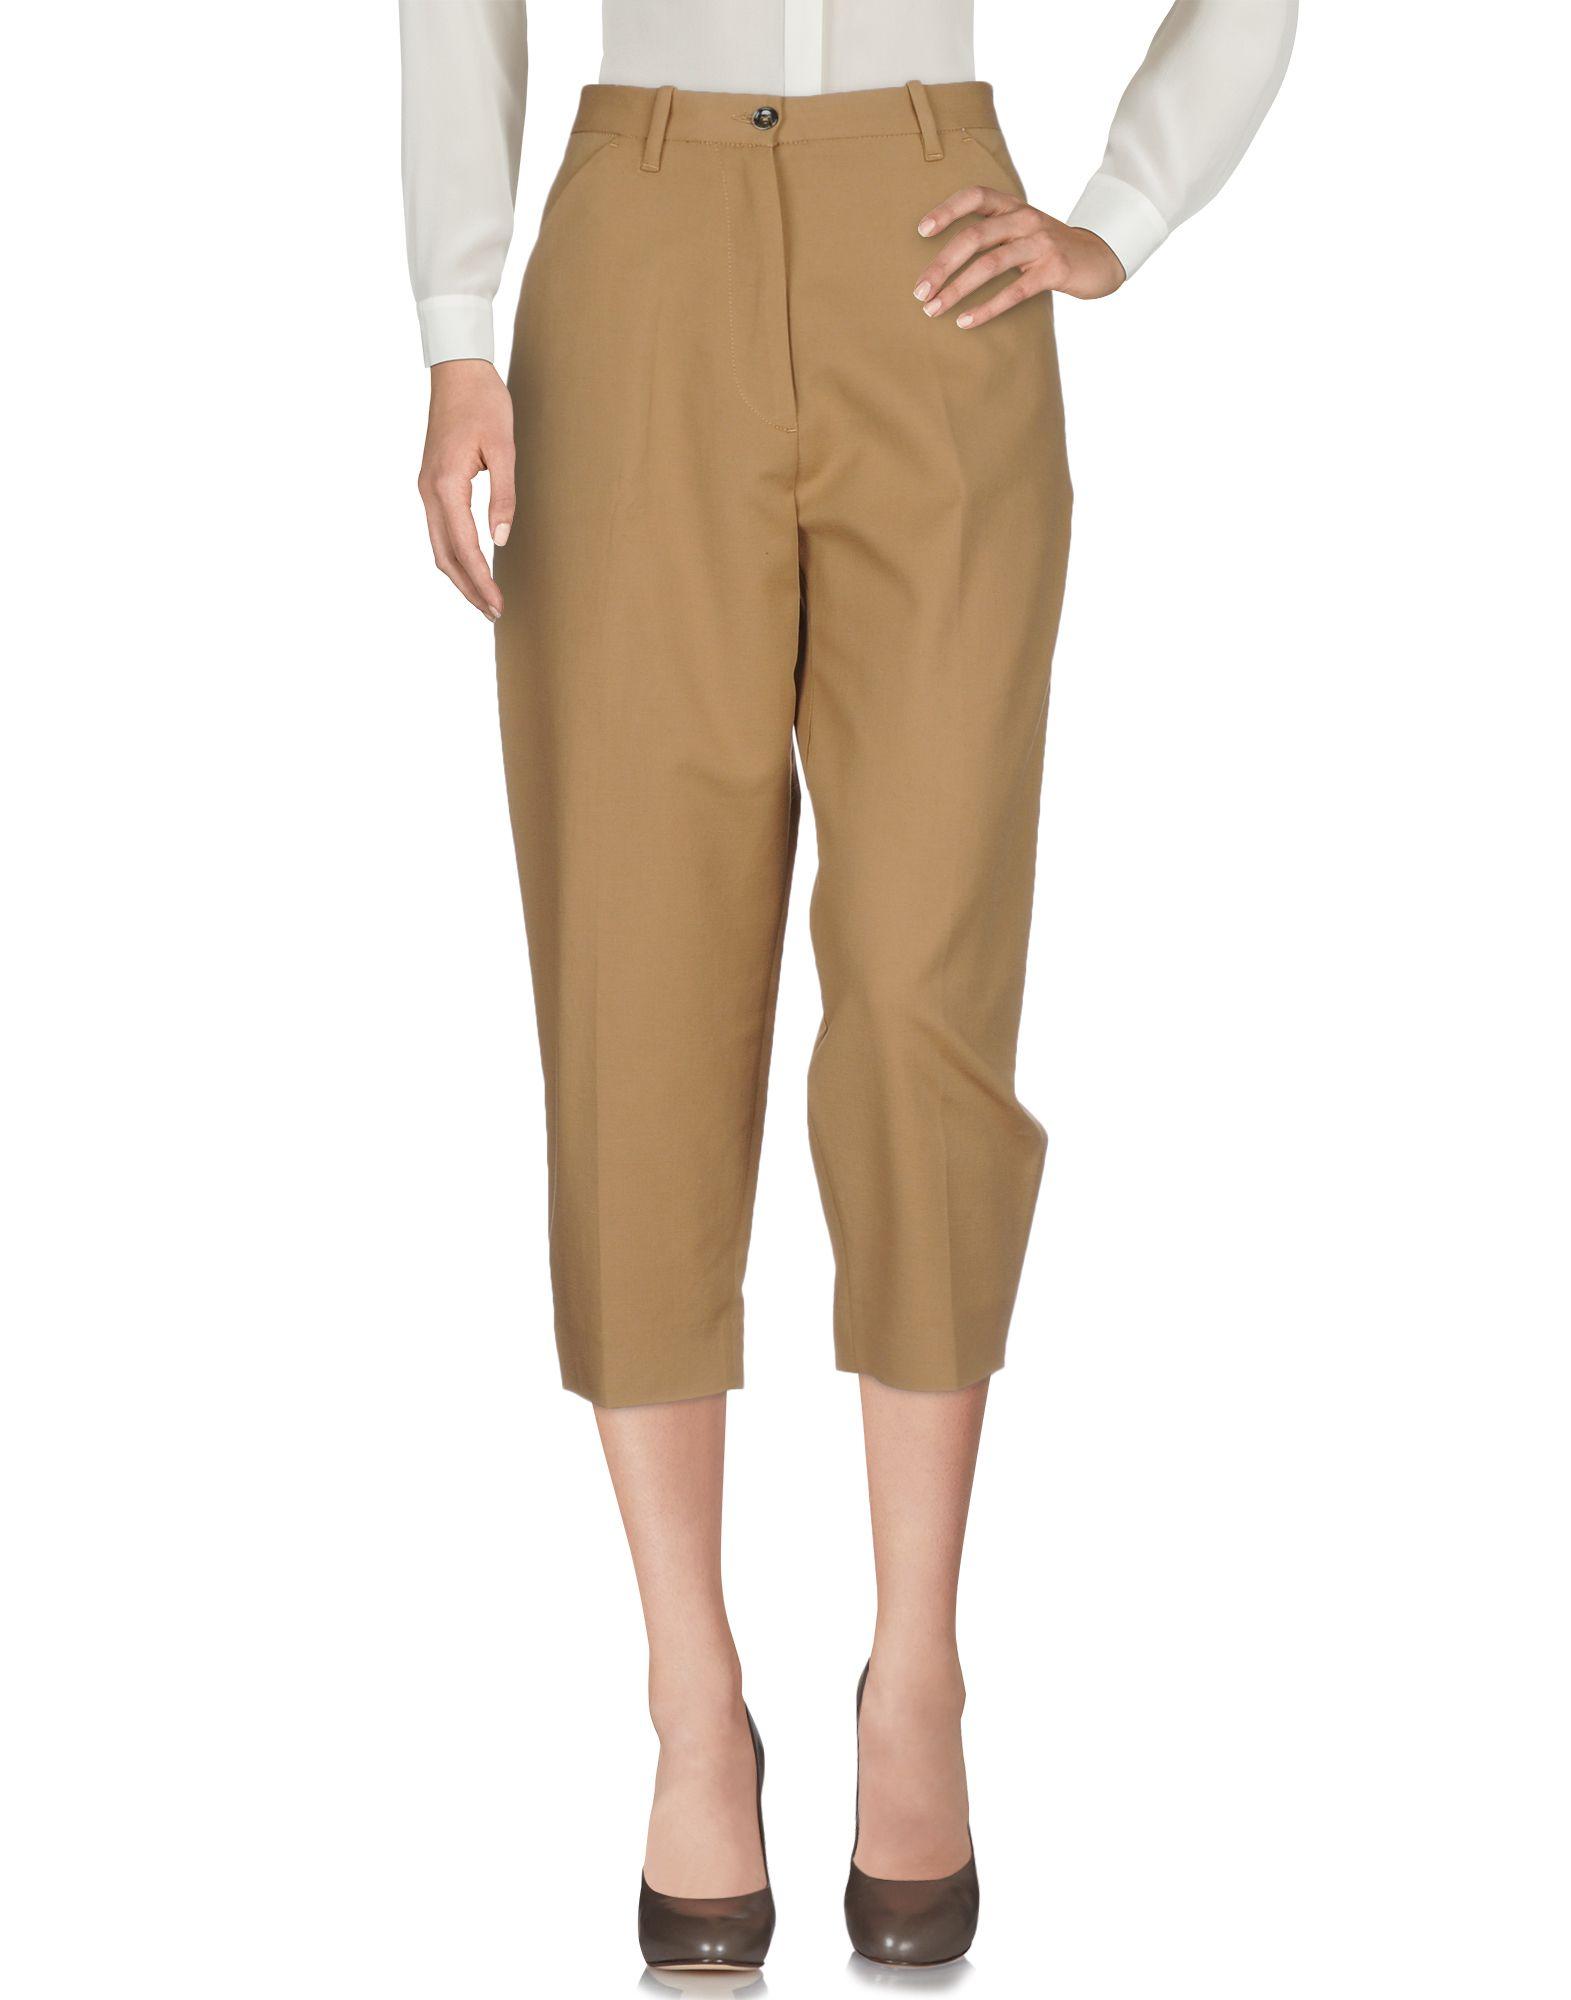 Pantalone Nine:Inthe:Morning Donna - Acquista online su fiAwiq68